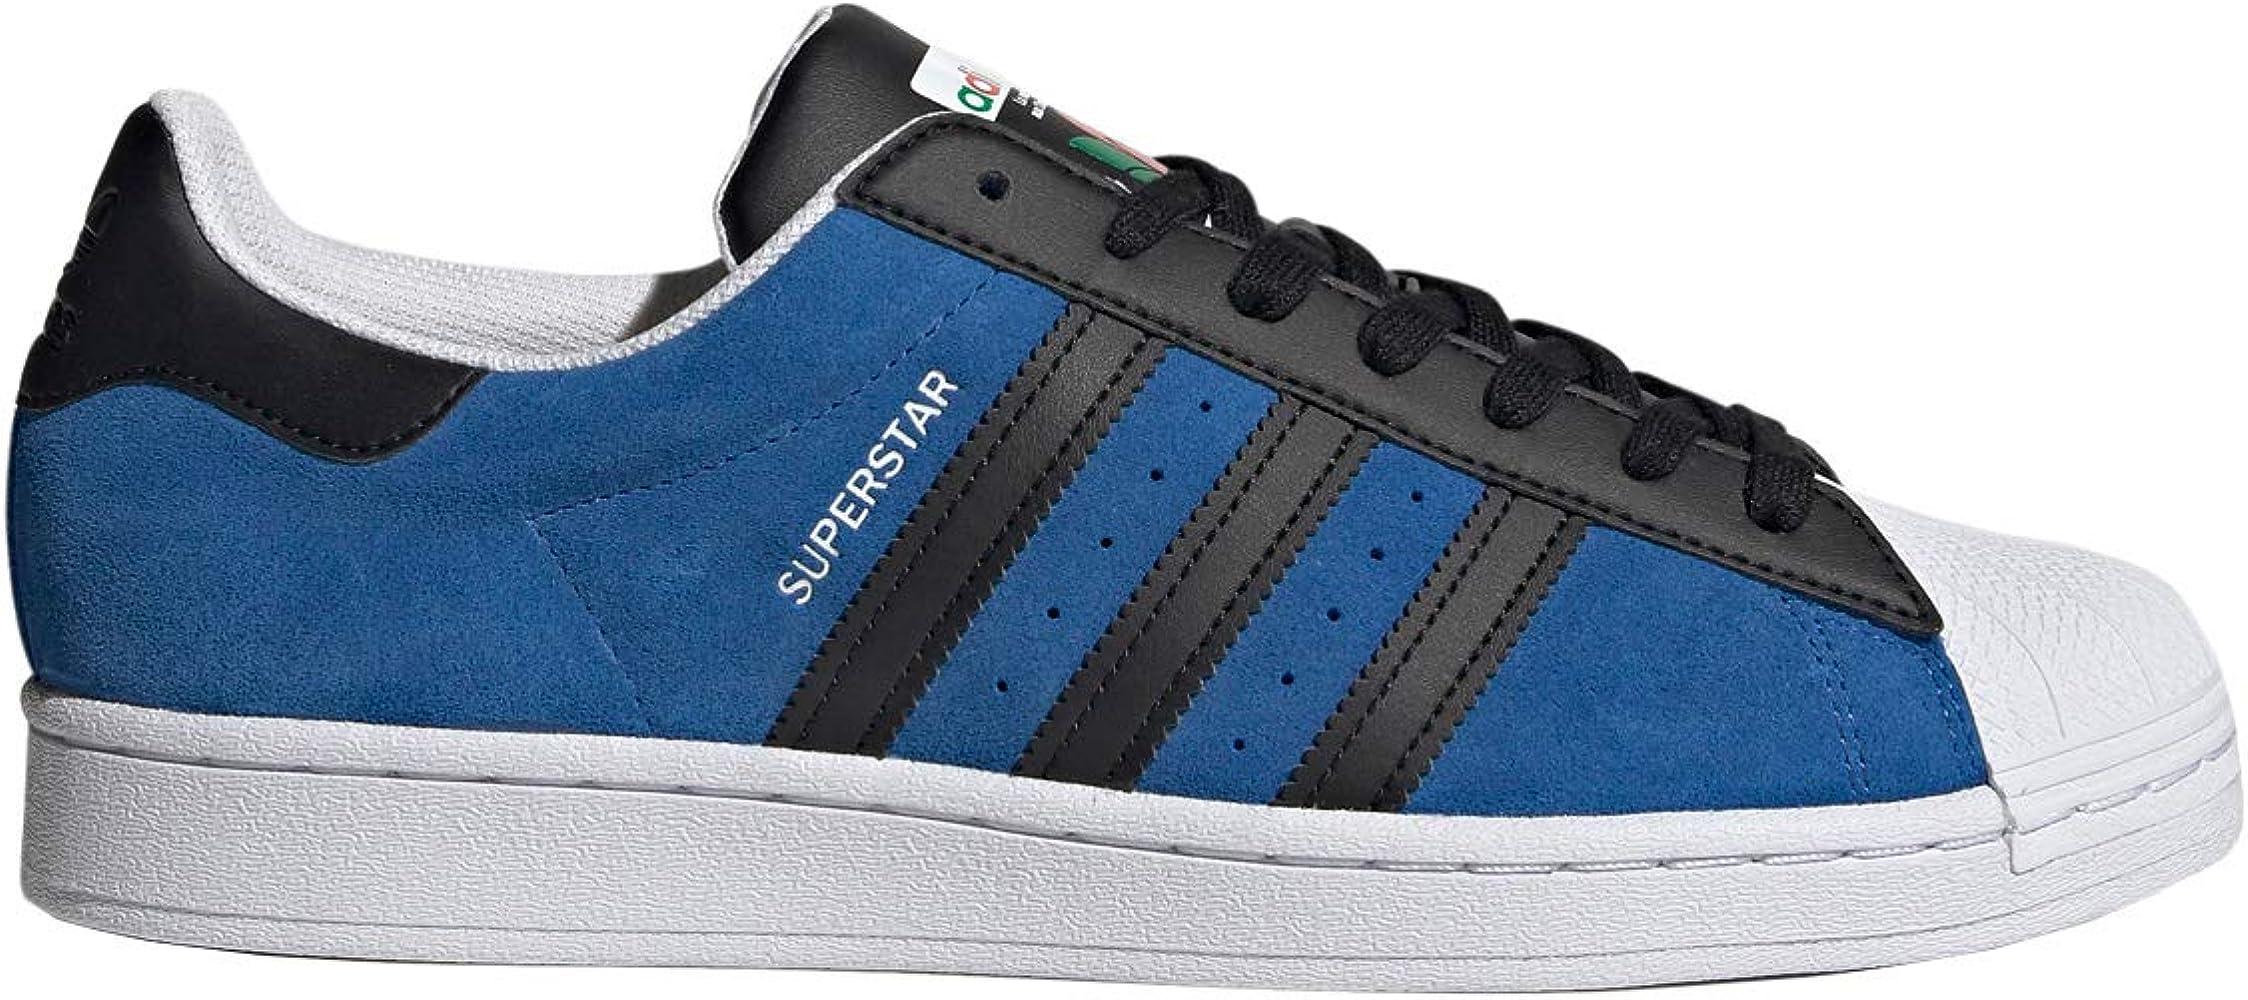 adidas Originals Superstar Mens Casual Fashion Sneaker Fu9523